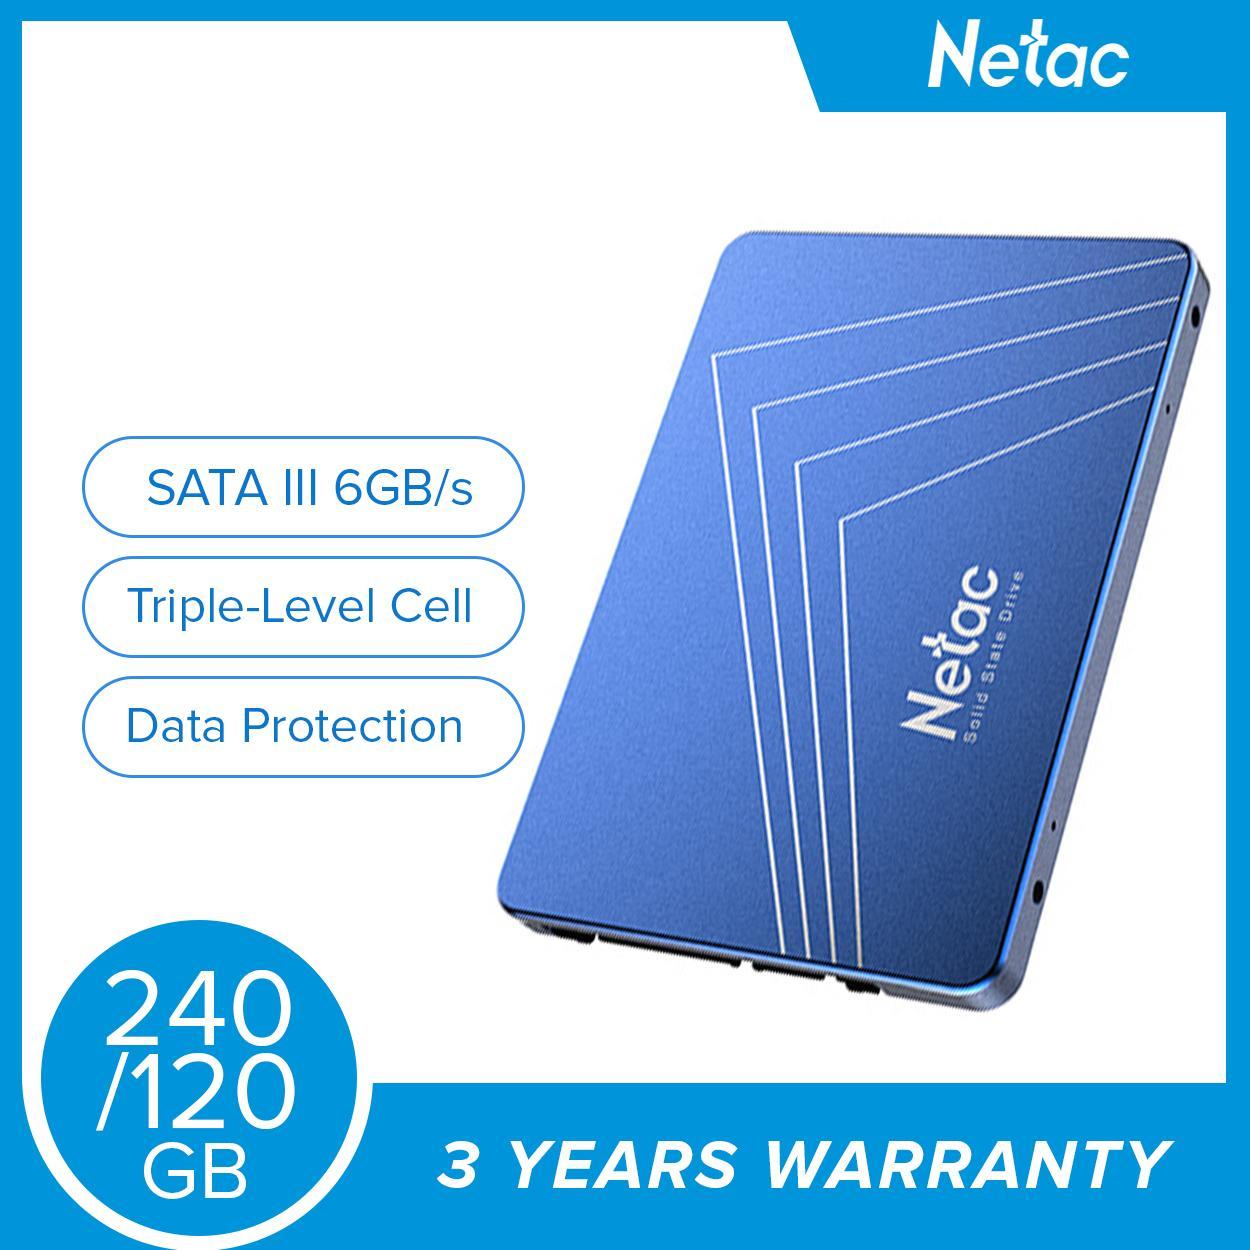 "Netac SSD N535S 2 5"" SATA III 6Gb/s 120GB/240GB Solid State Drive (Blue)"